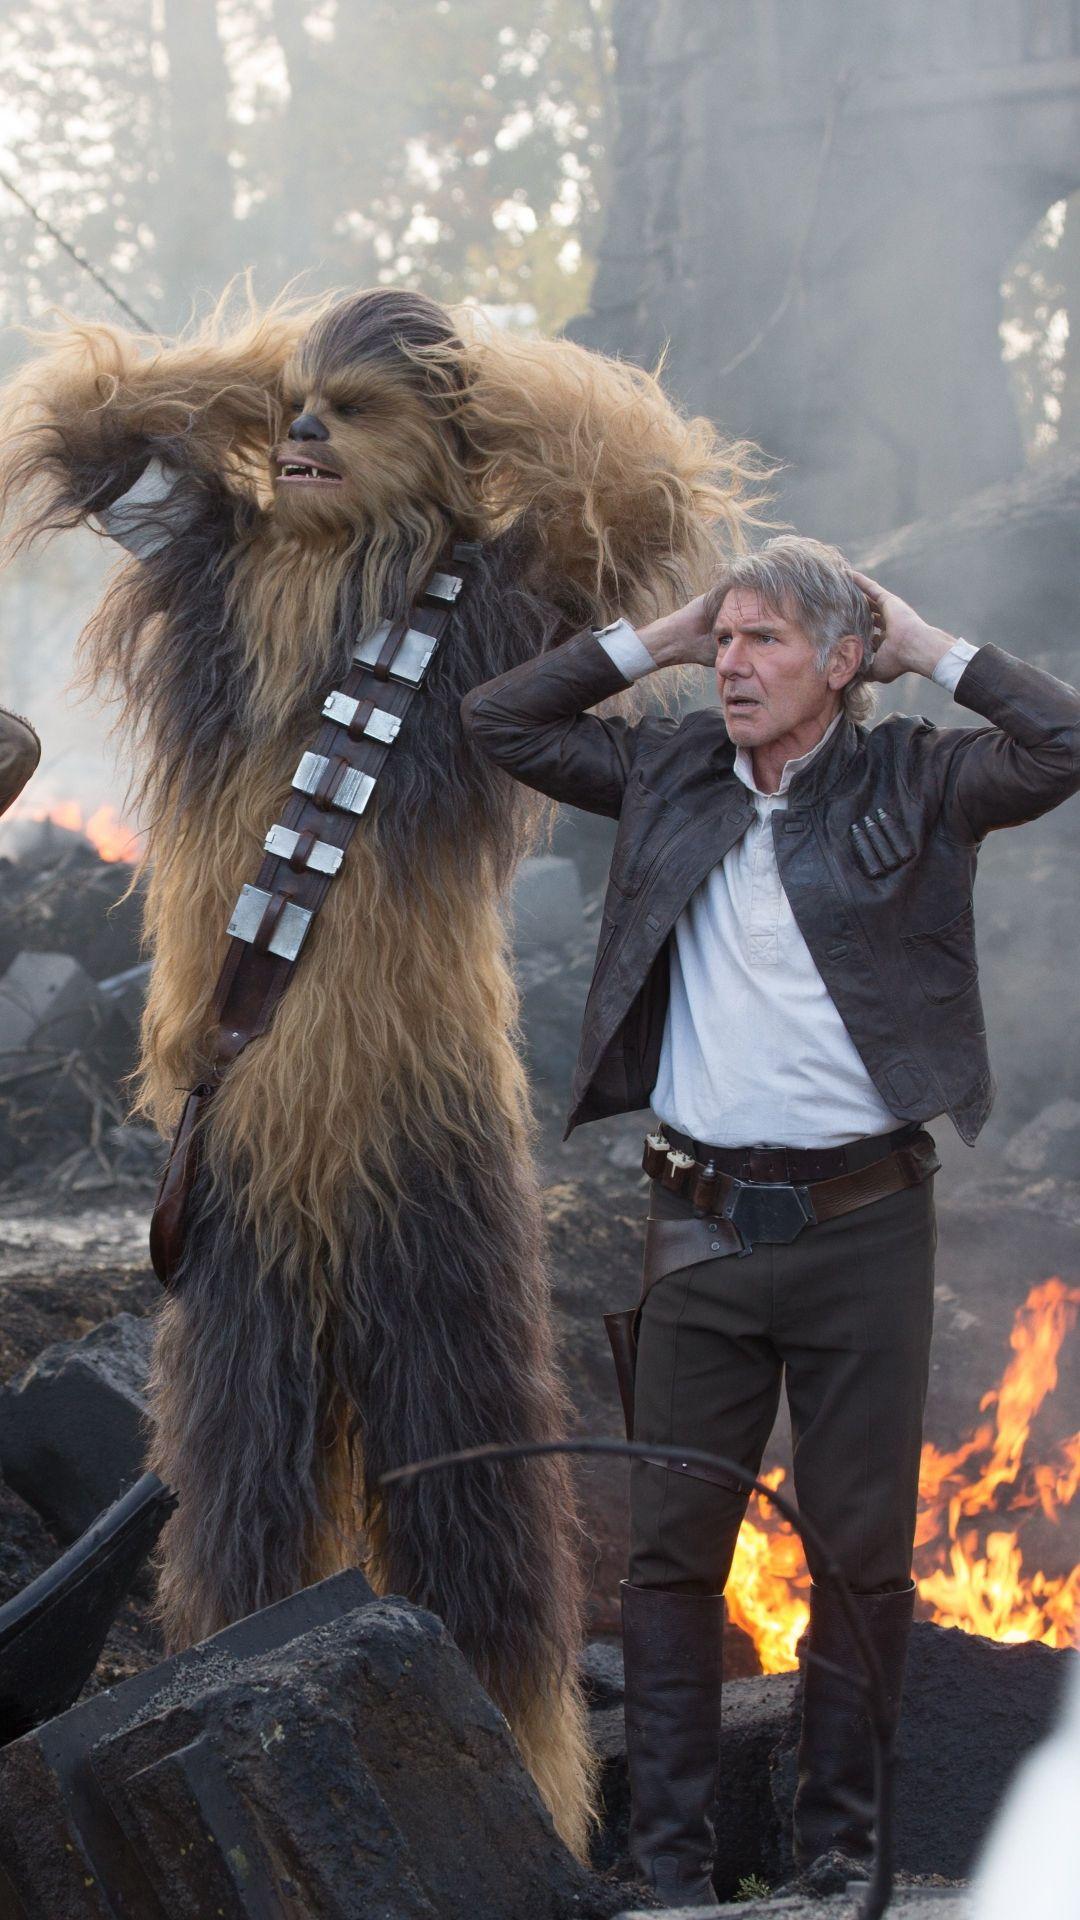 Movie Star Wars Episode Vii The Force Awakens Star Wars Chewbacca John Boyega Finn Han Solo Harri Star Wars Episode Vii Star Wars Episodes Star Wars Wallpaper